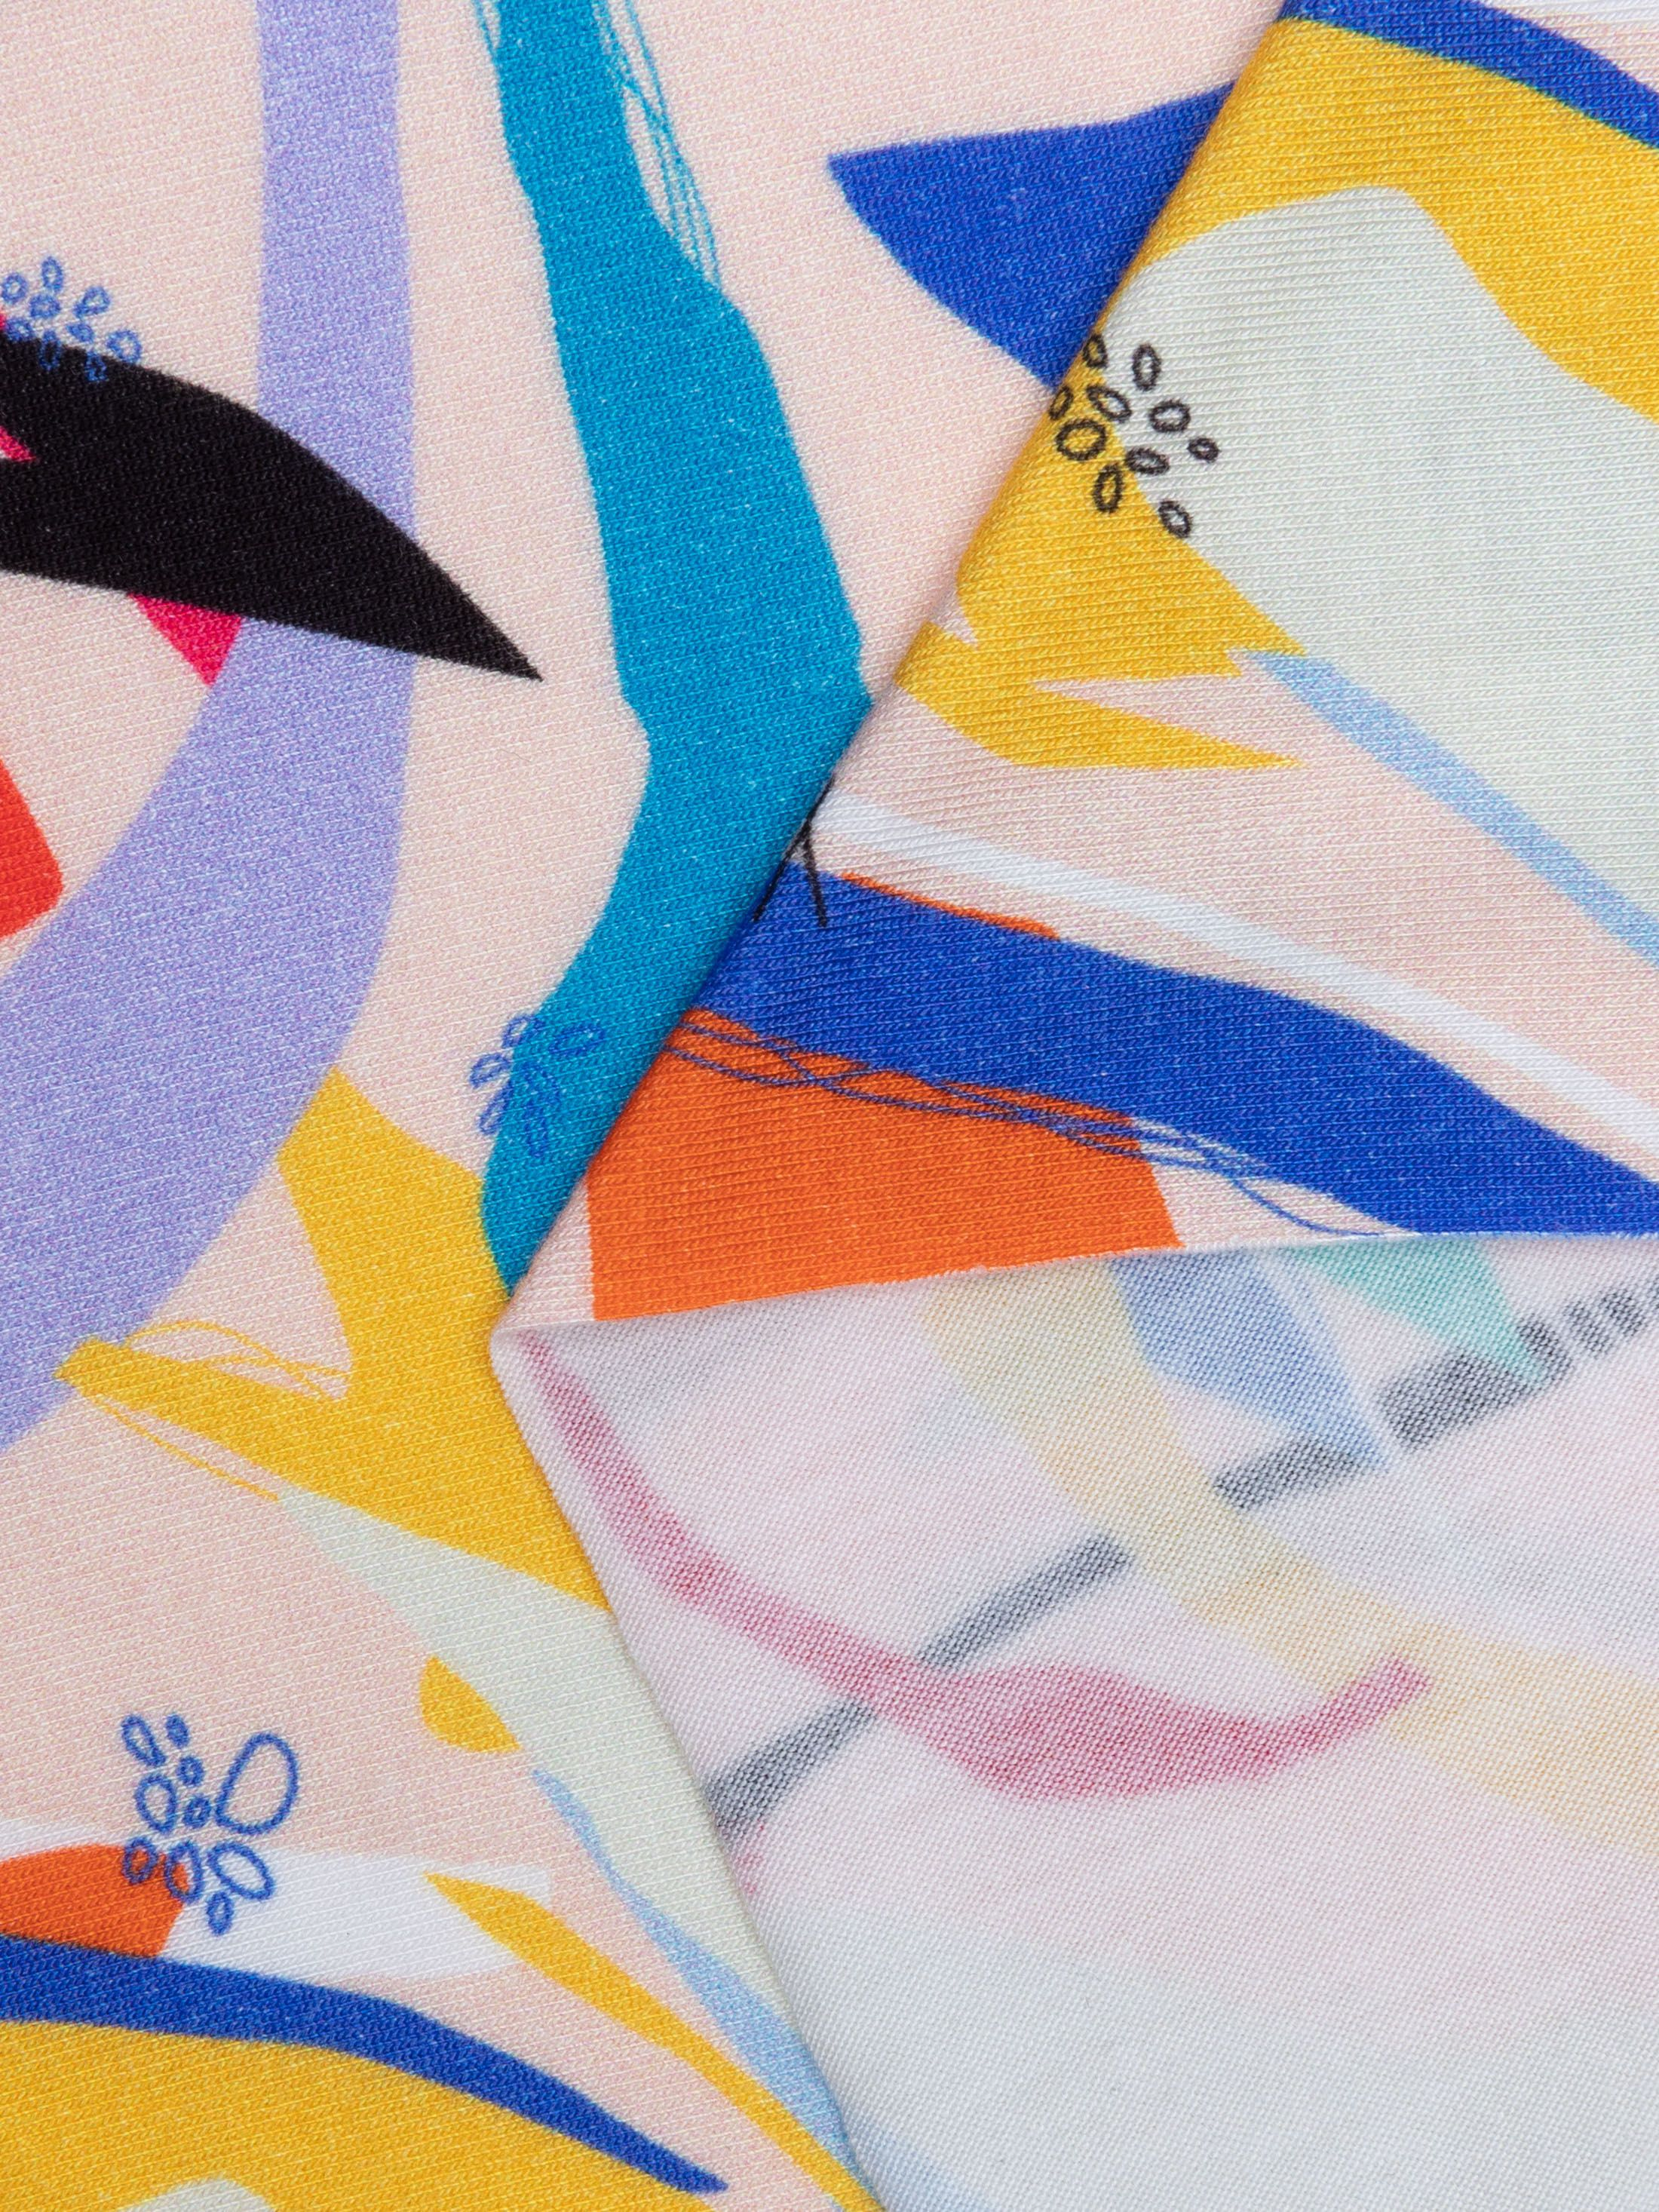 Printed Viscose Jersey Fabric